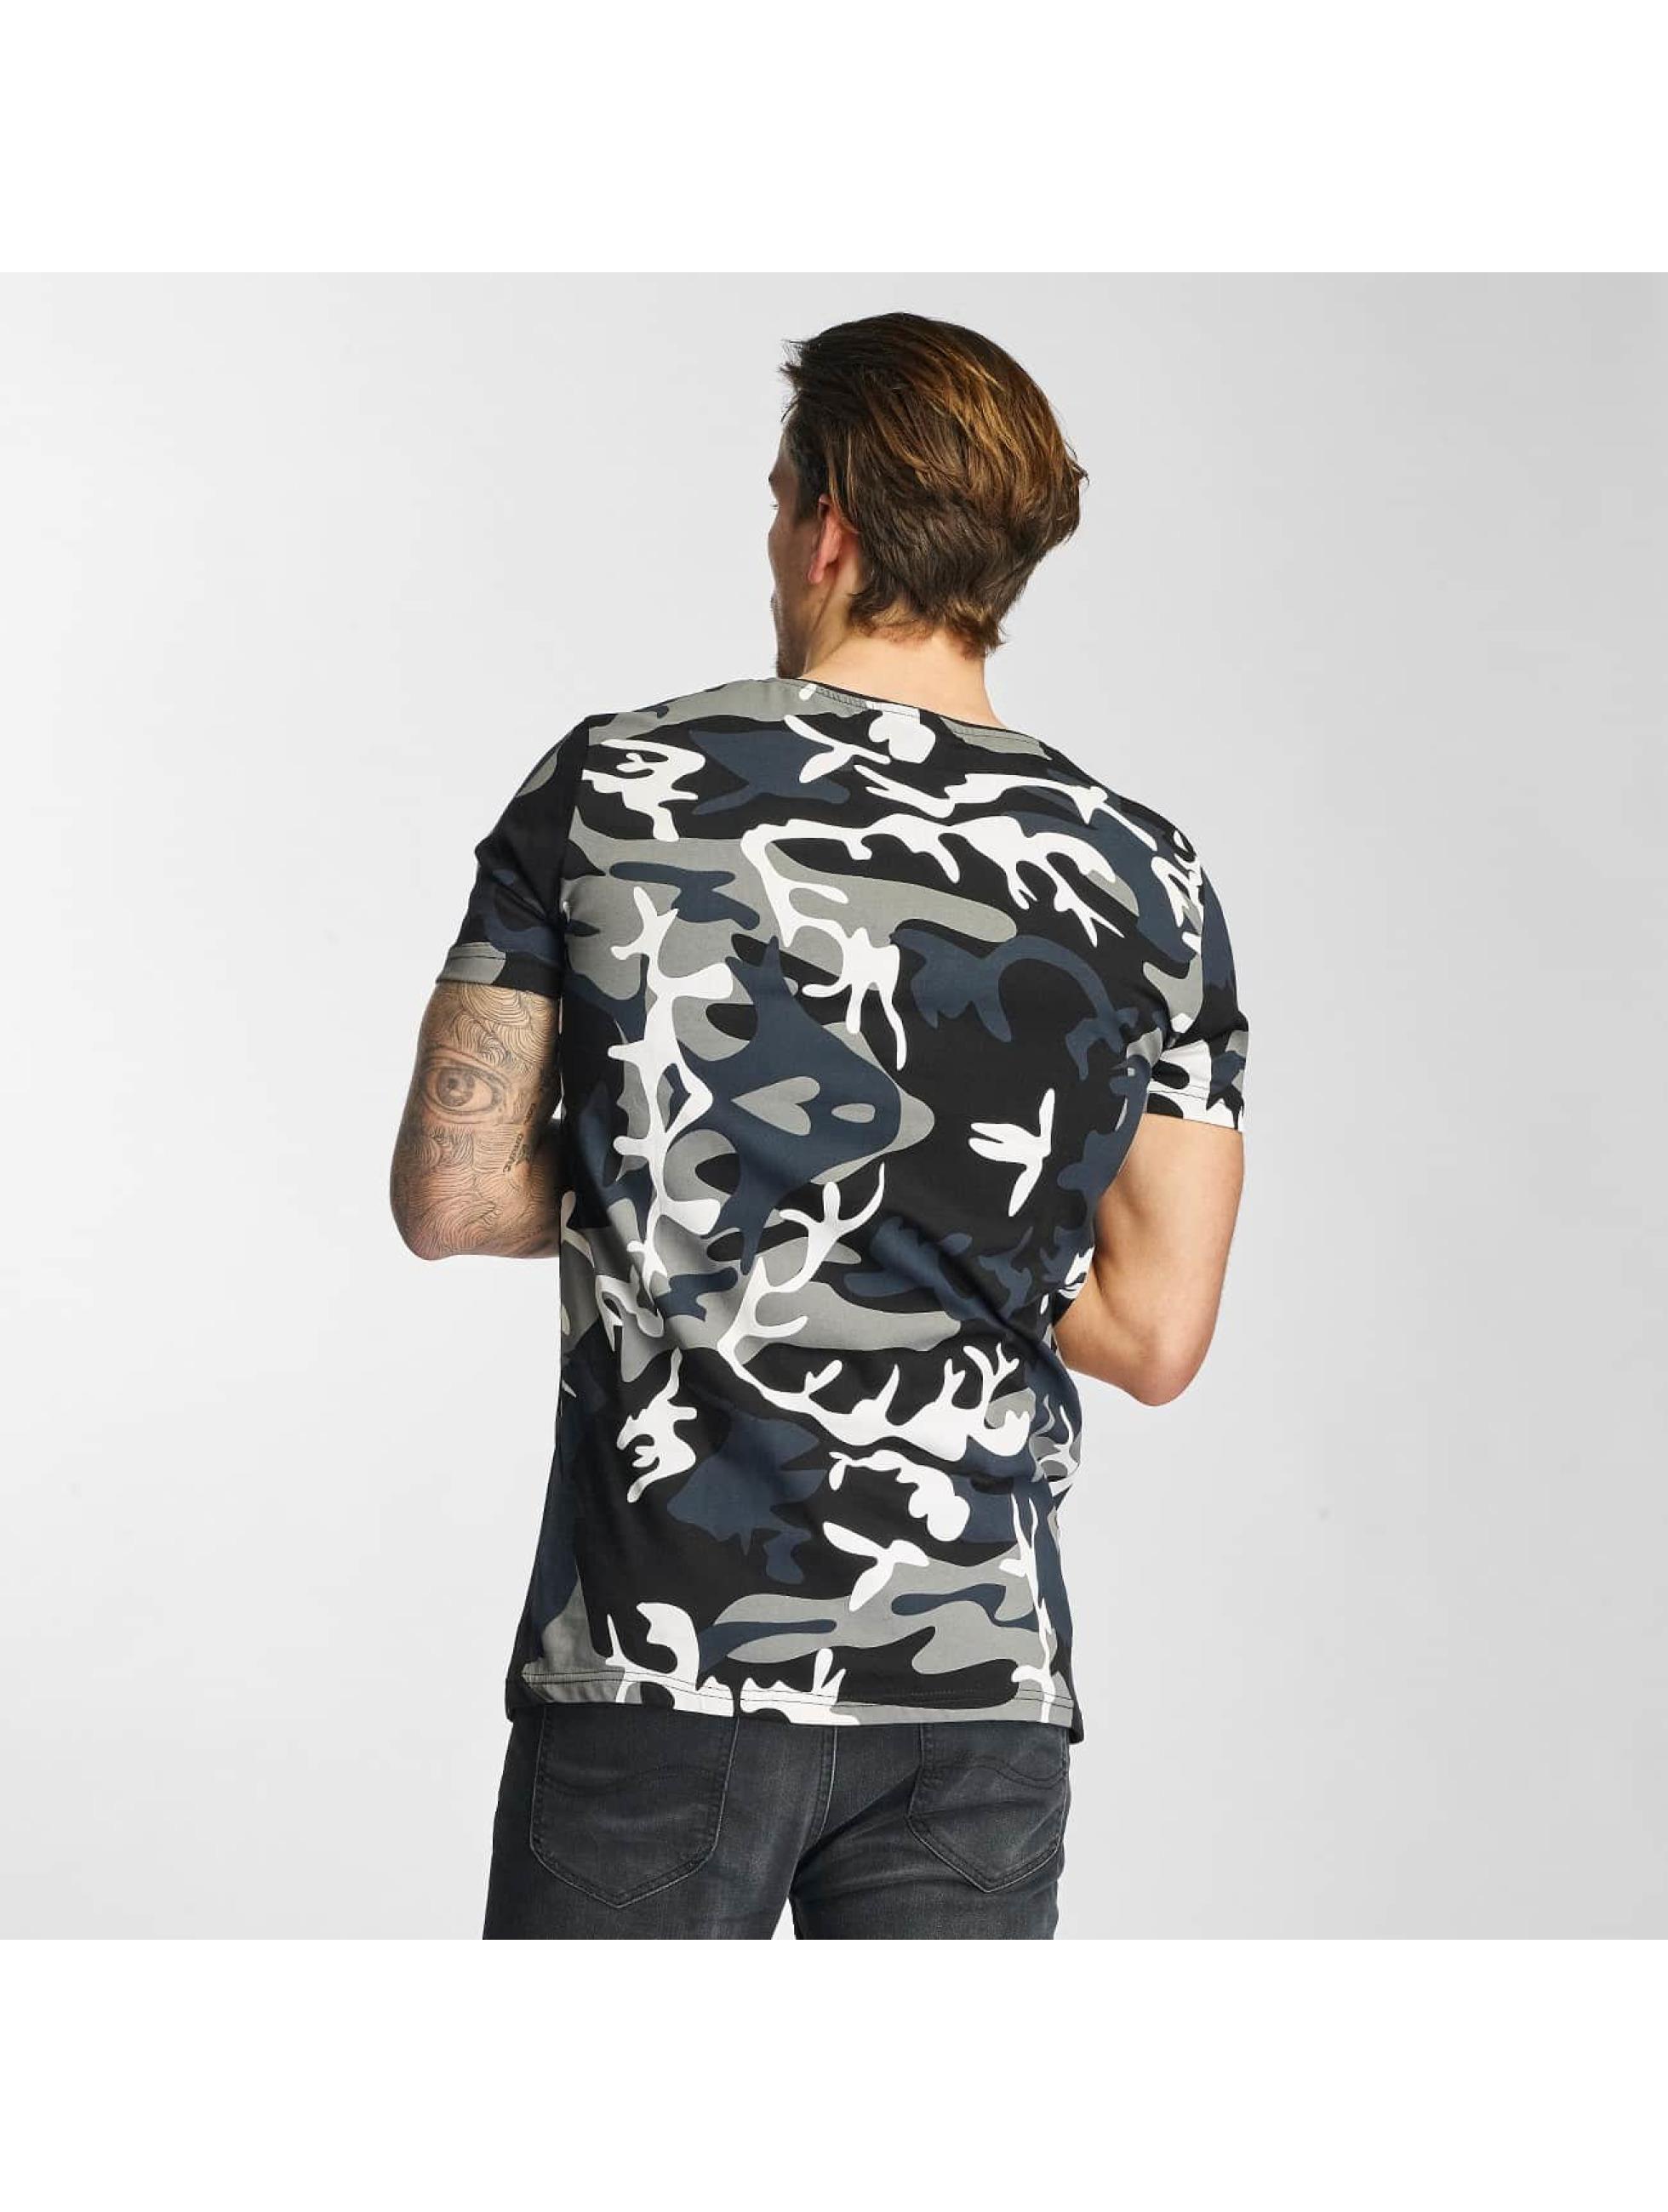 2Y T-Shirt Camo black